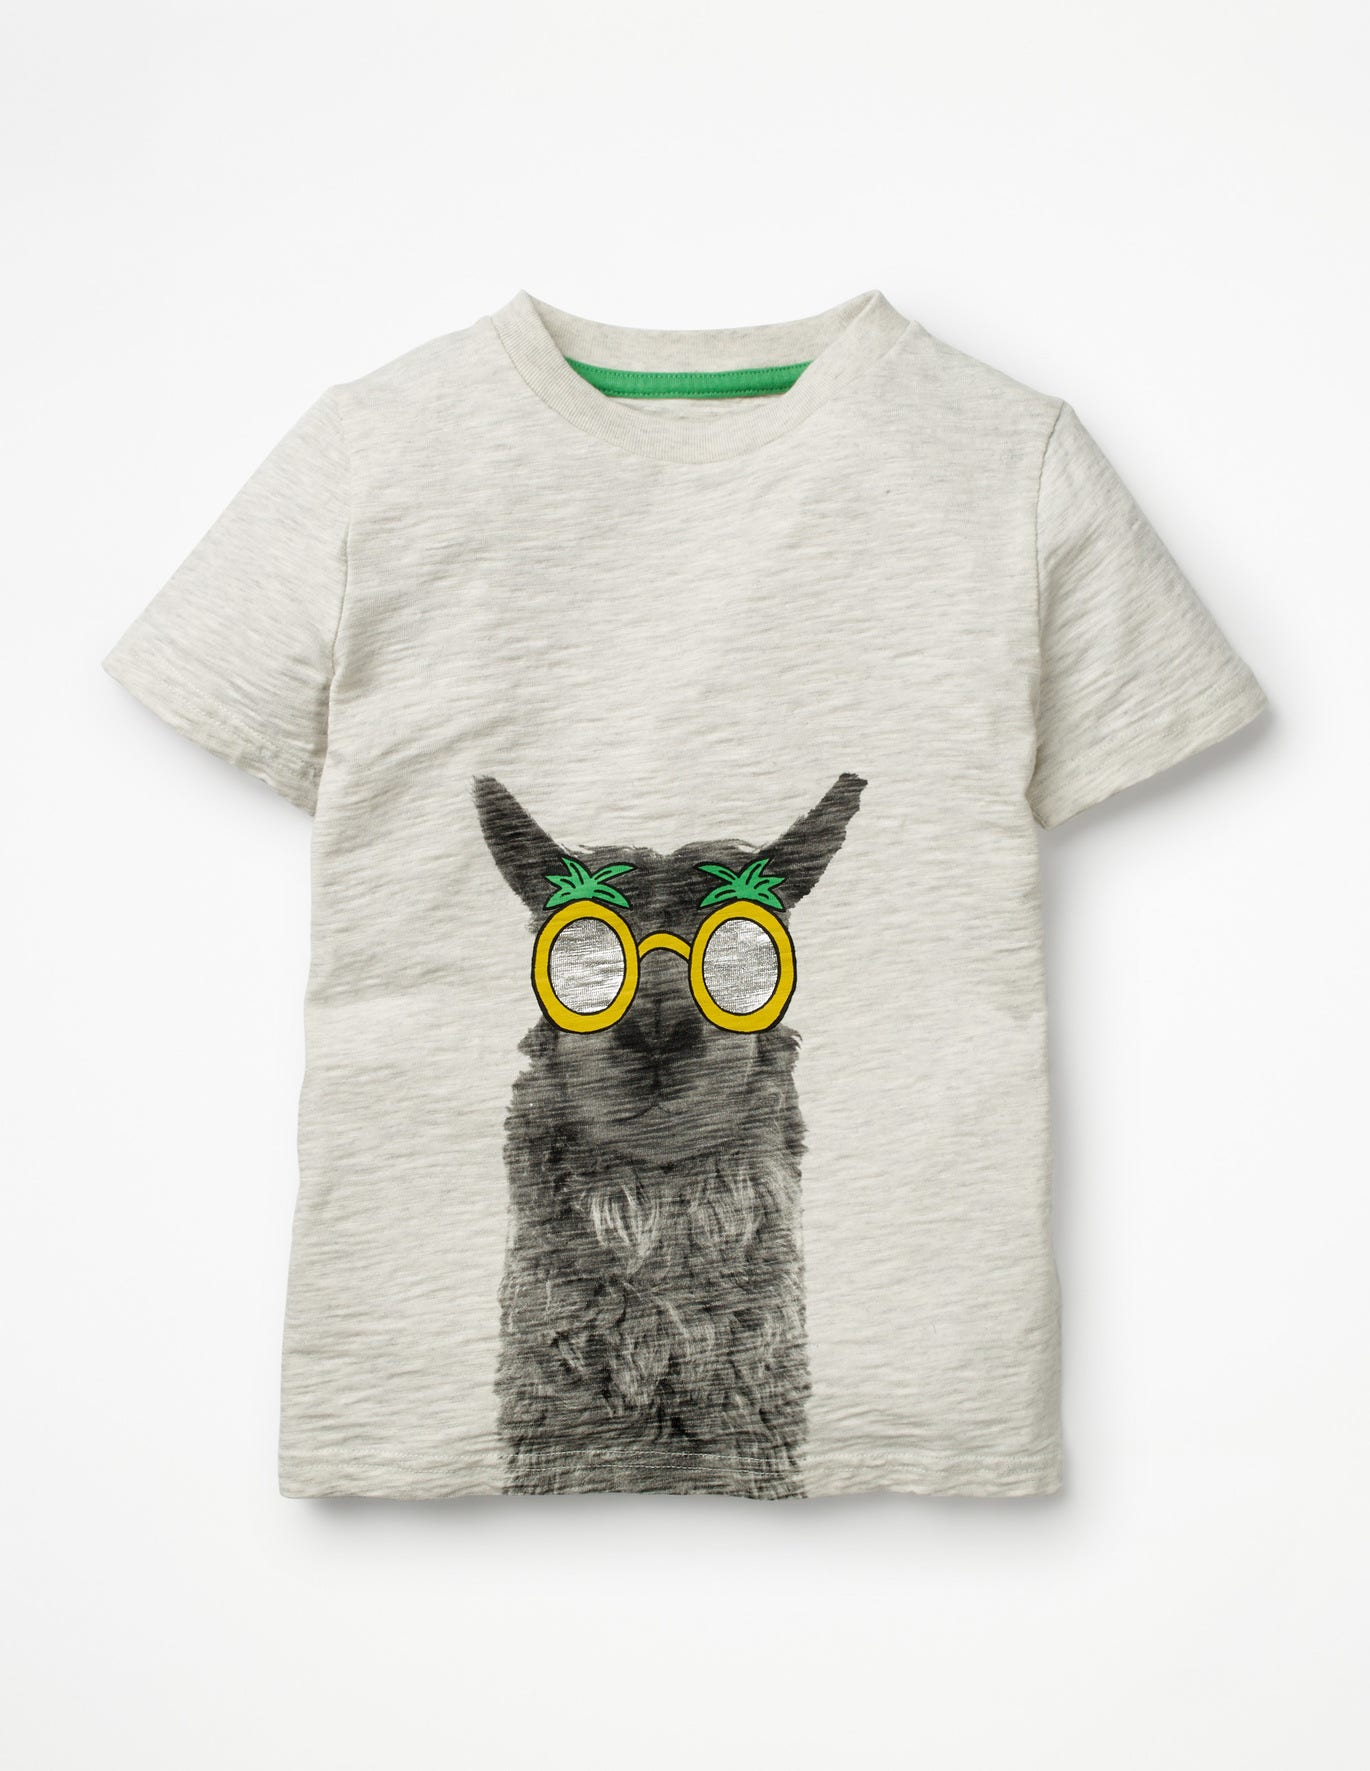 Animal Graphic T-Shirt - Oatmeal Photographic Llama